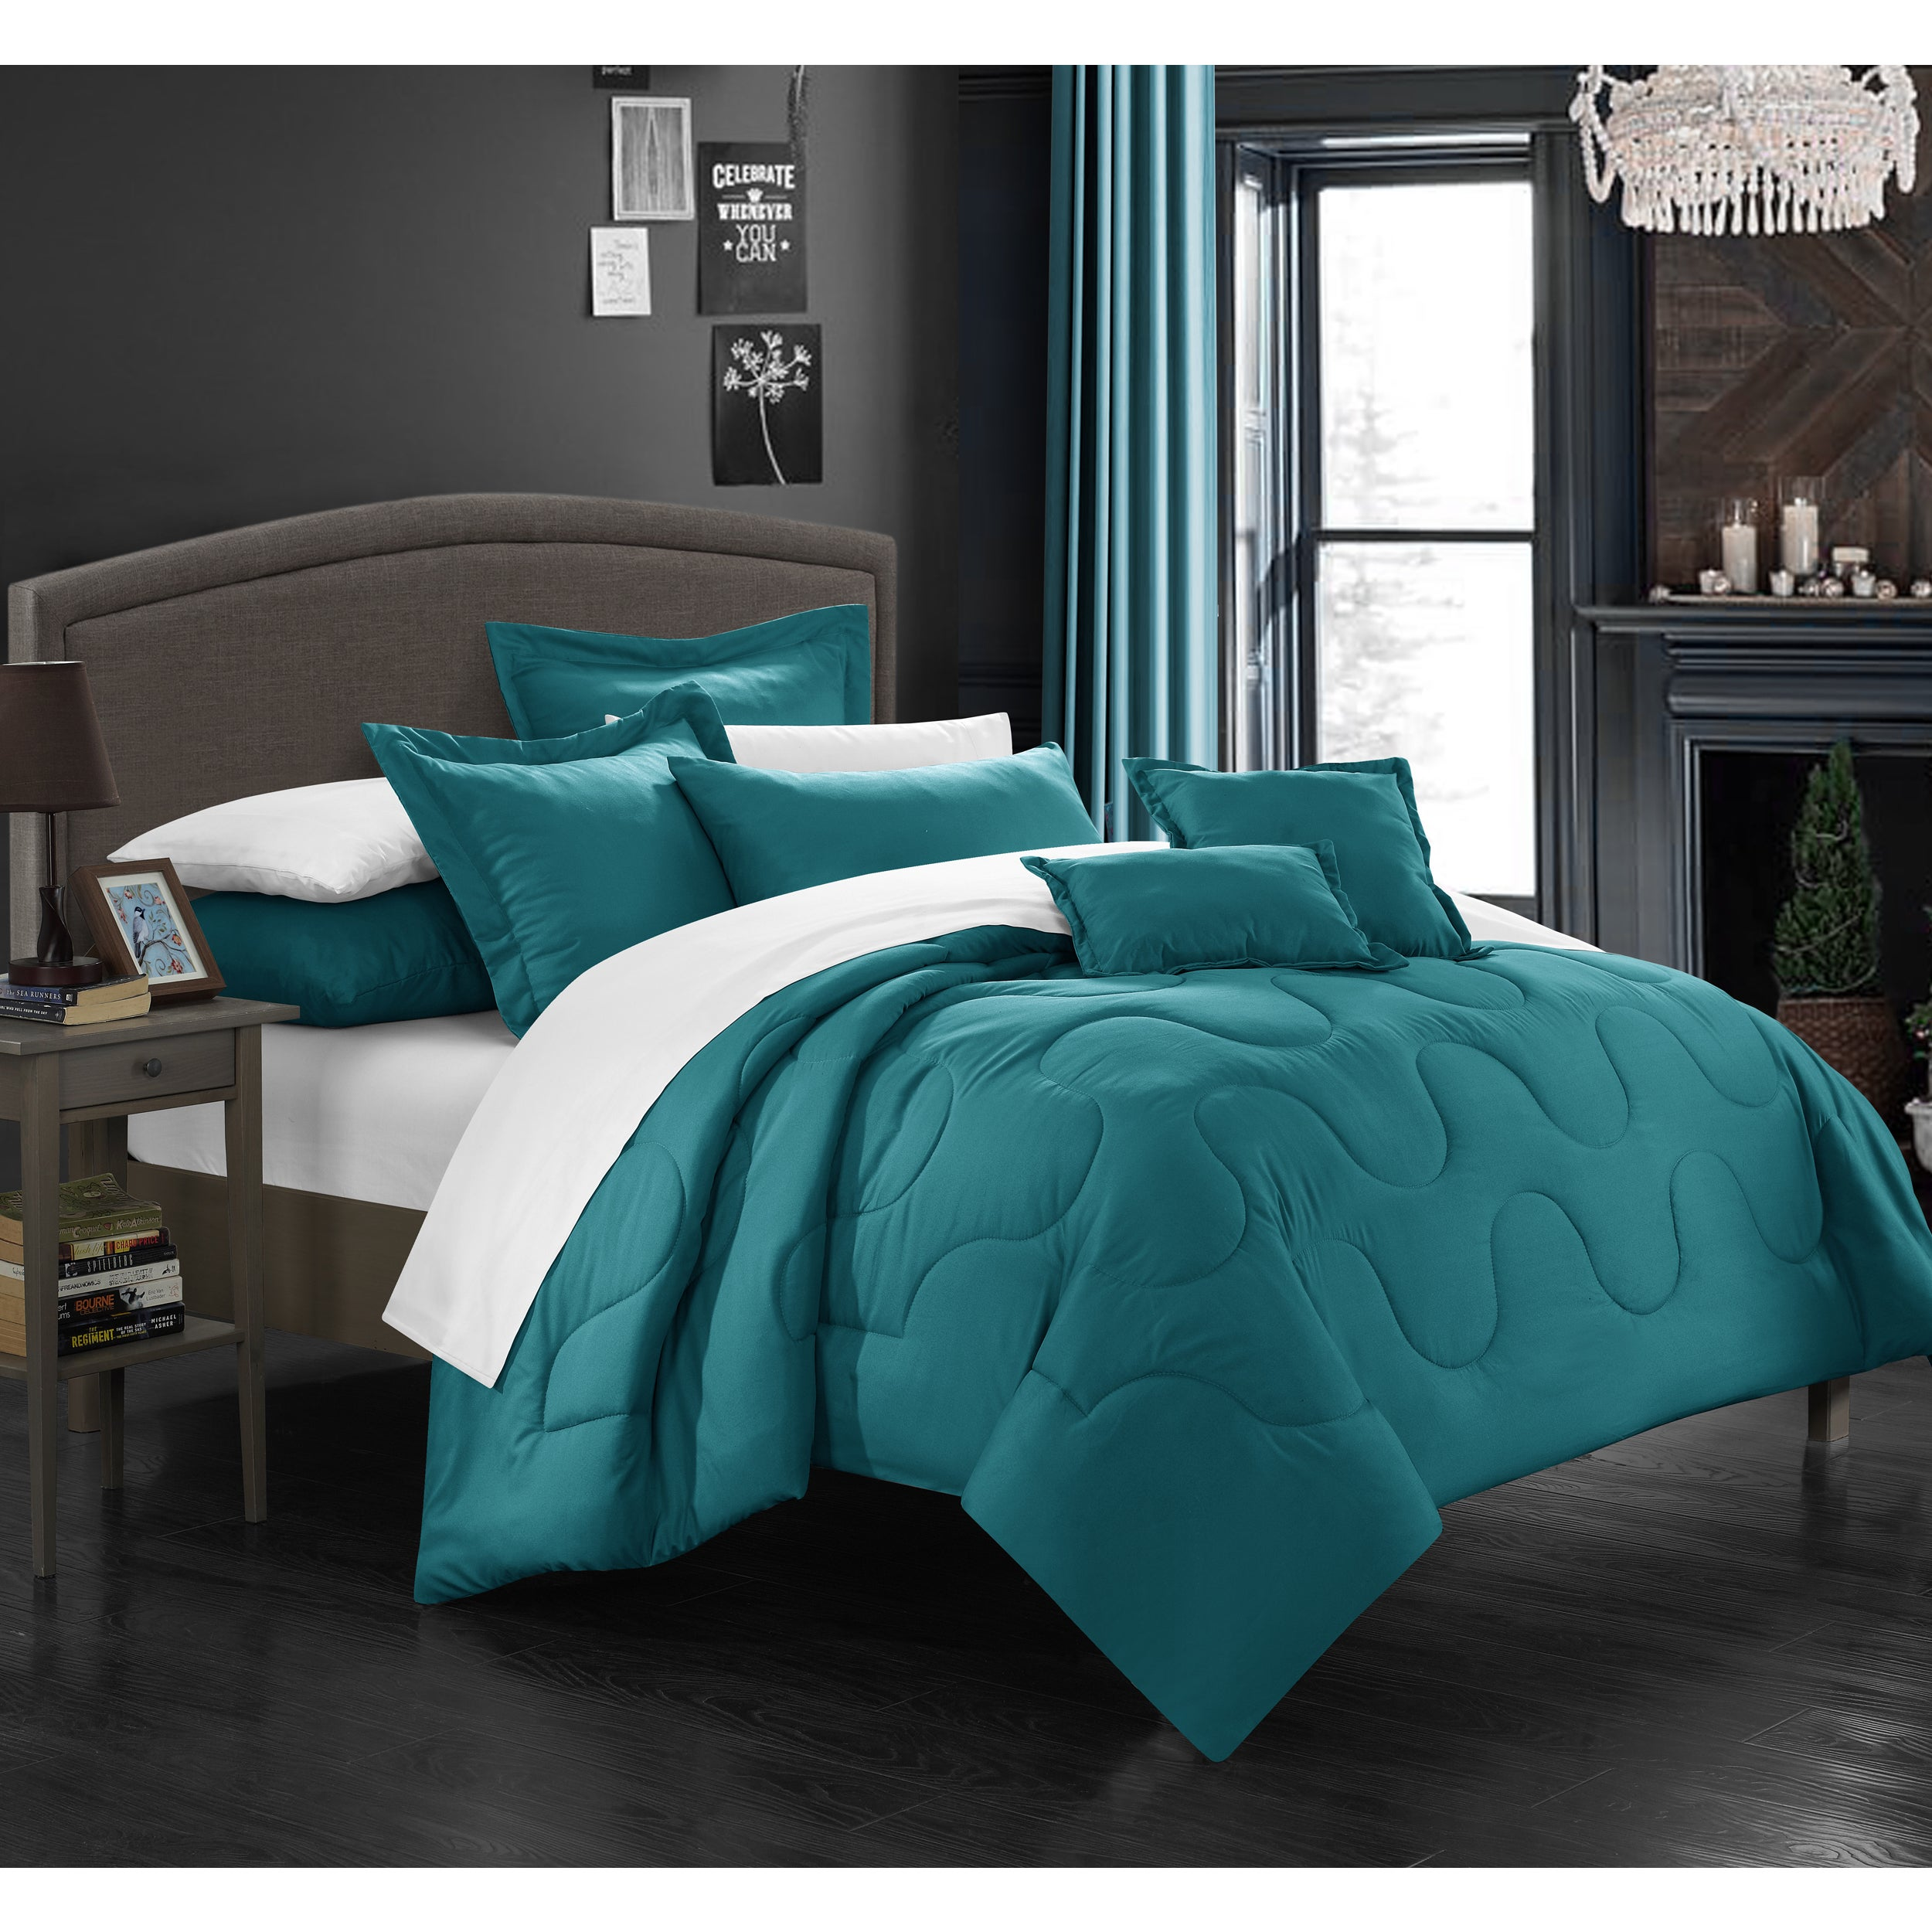 Chic Home Direllei Teal Down Alternative 7-piece Comforter Set